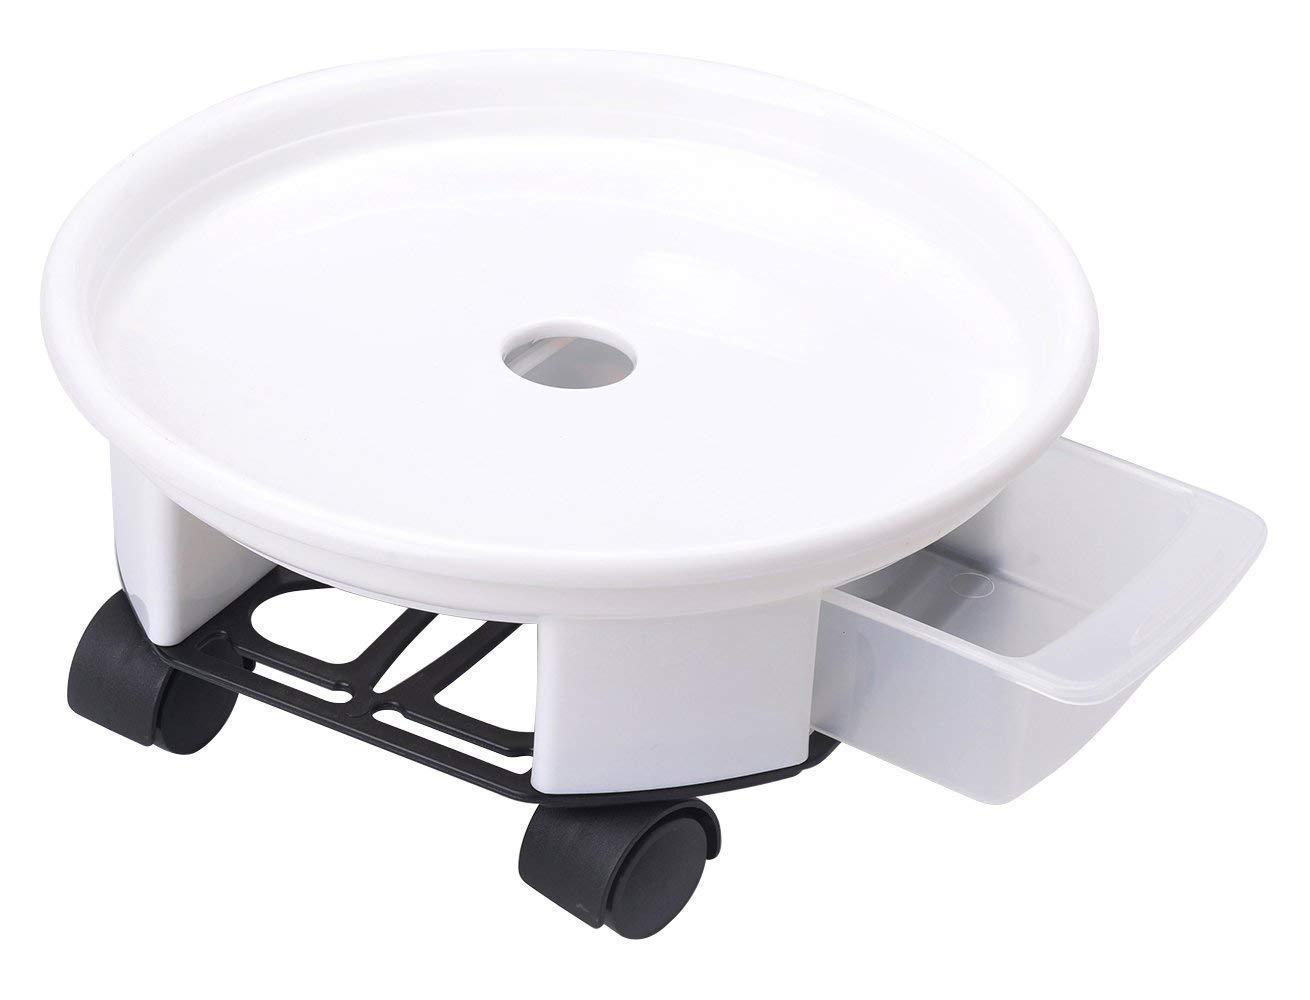 blanco EPNT 1 soporte redondo para macetas con ruedas para mover macetas